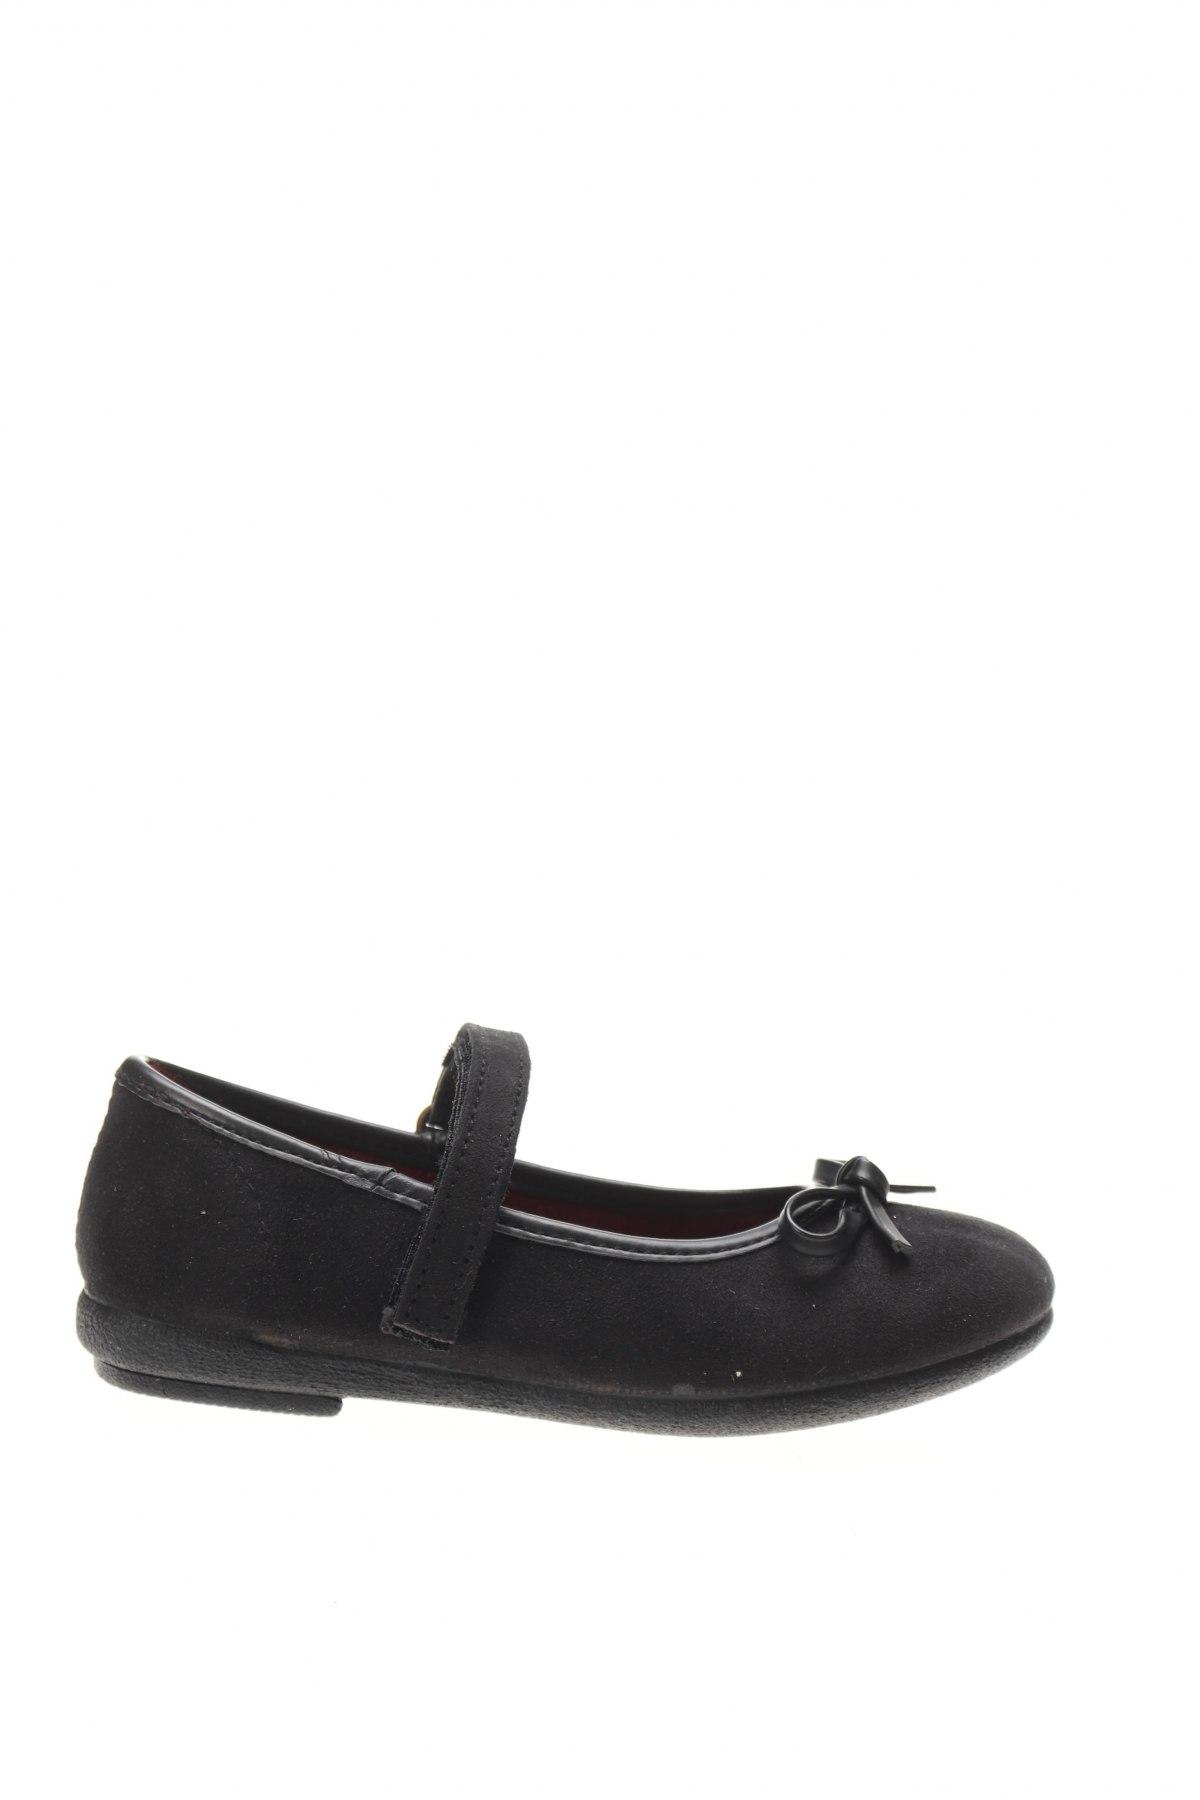 Детски обувки Lola Palacios, Размер 25, Цвят Черен, Текстил, еко кожа, Цена 13,70лв.